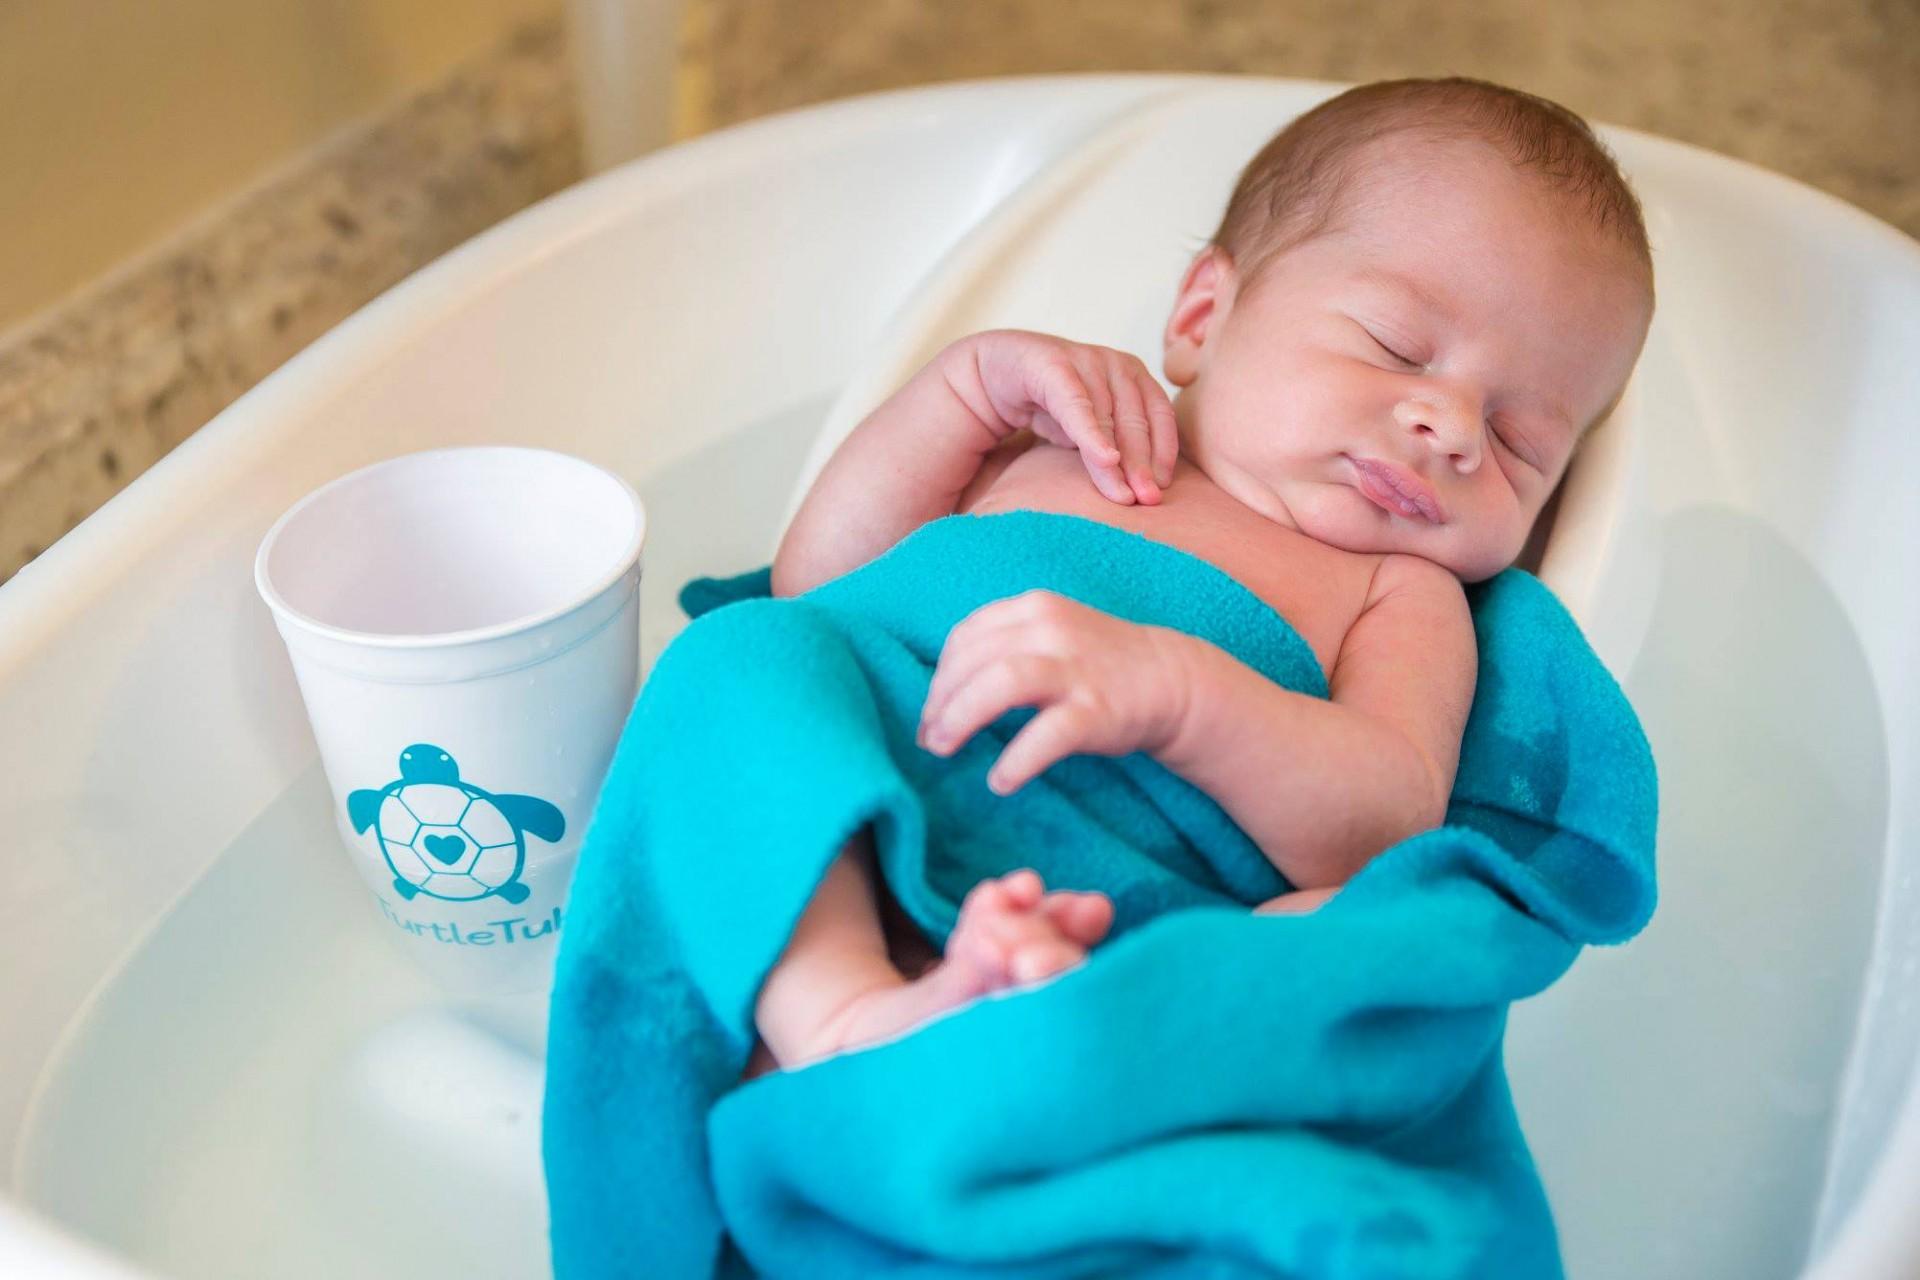 Baby in TurtleTub fleece blanket